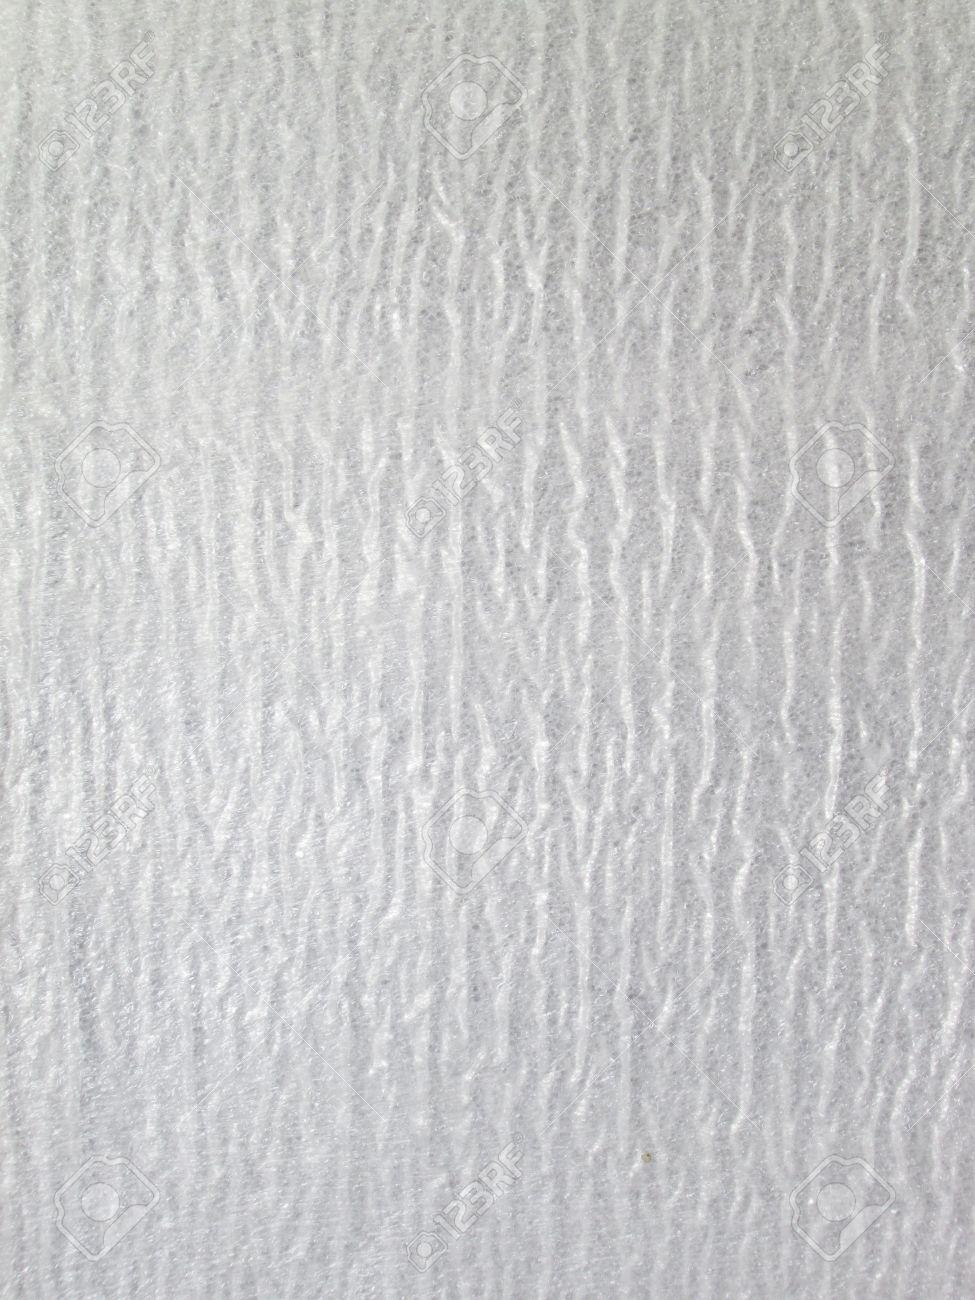 Gray White Background Color Off White Pale Paper Elegant